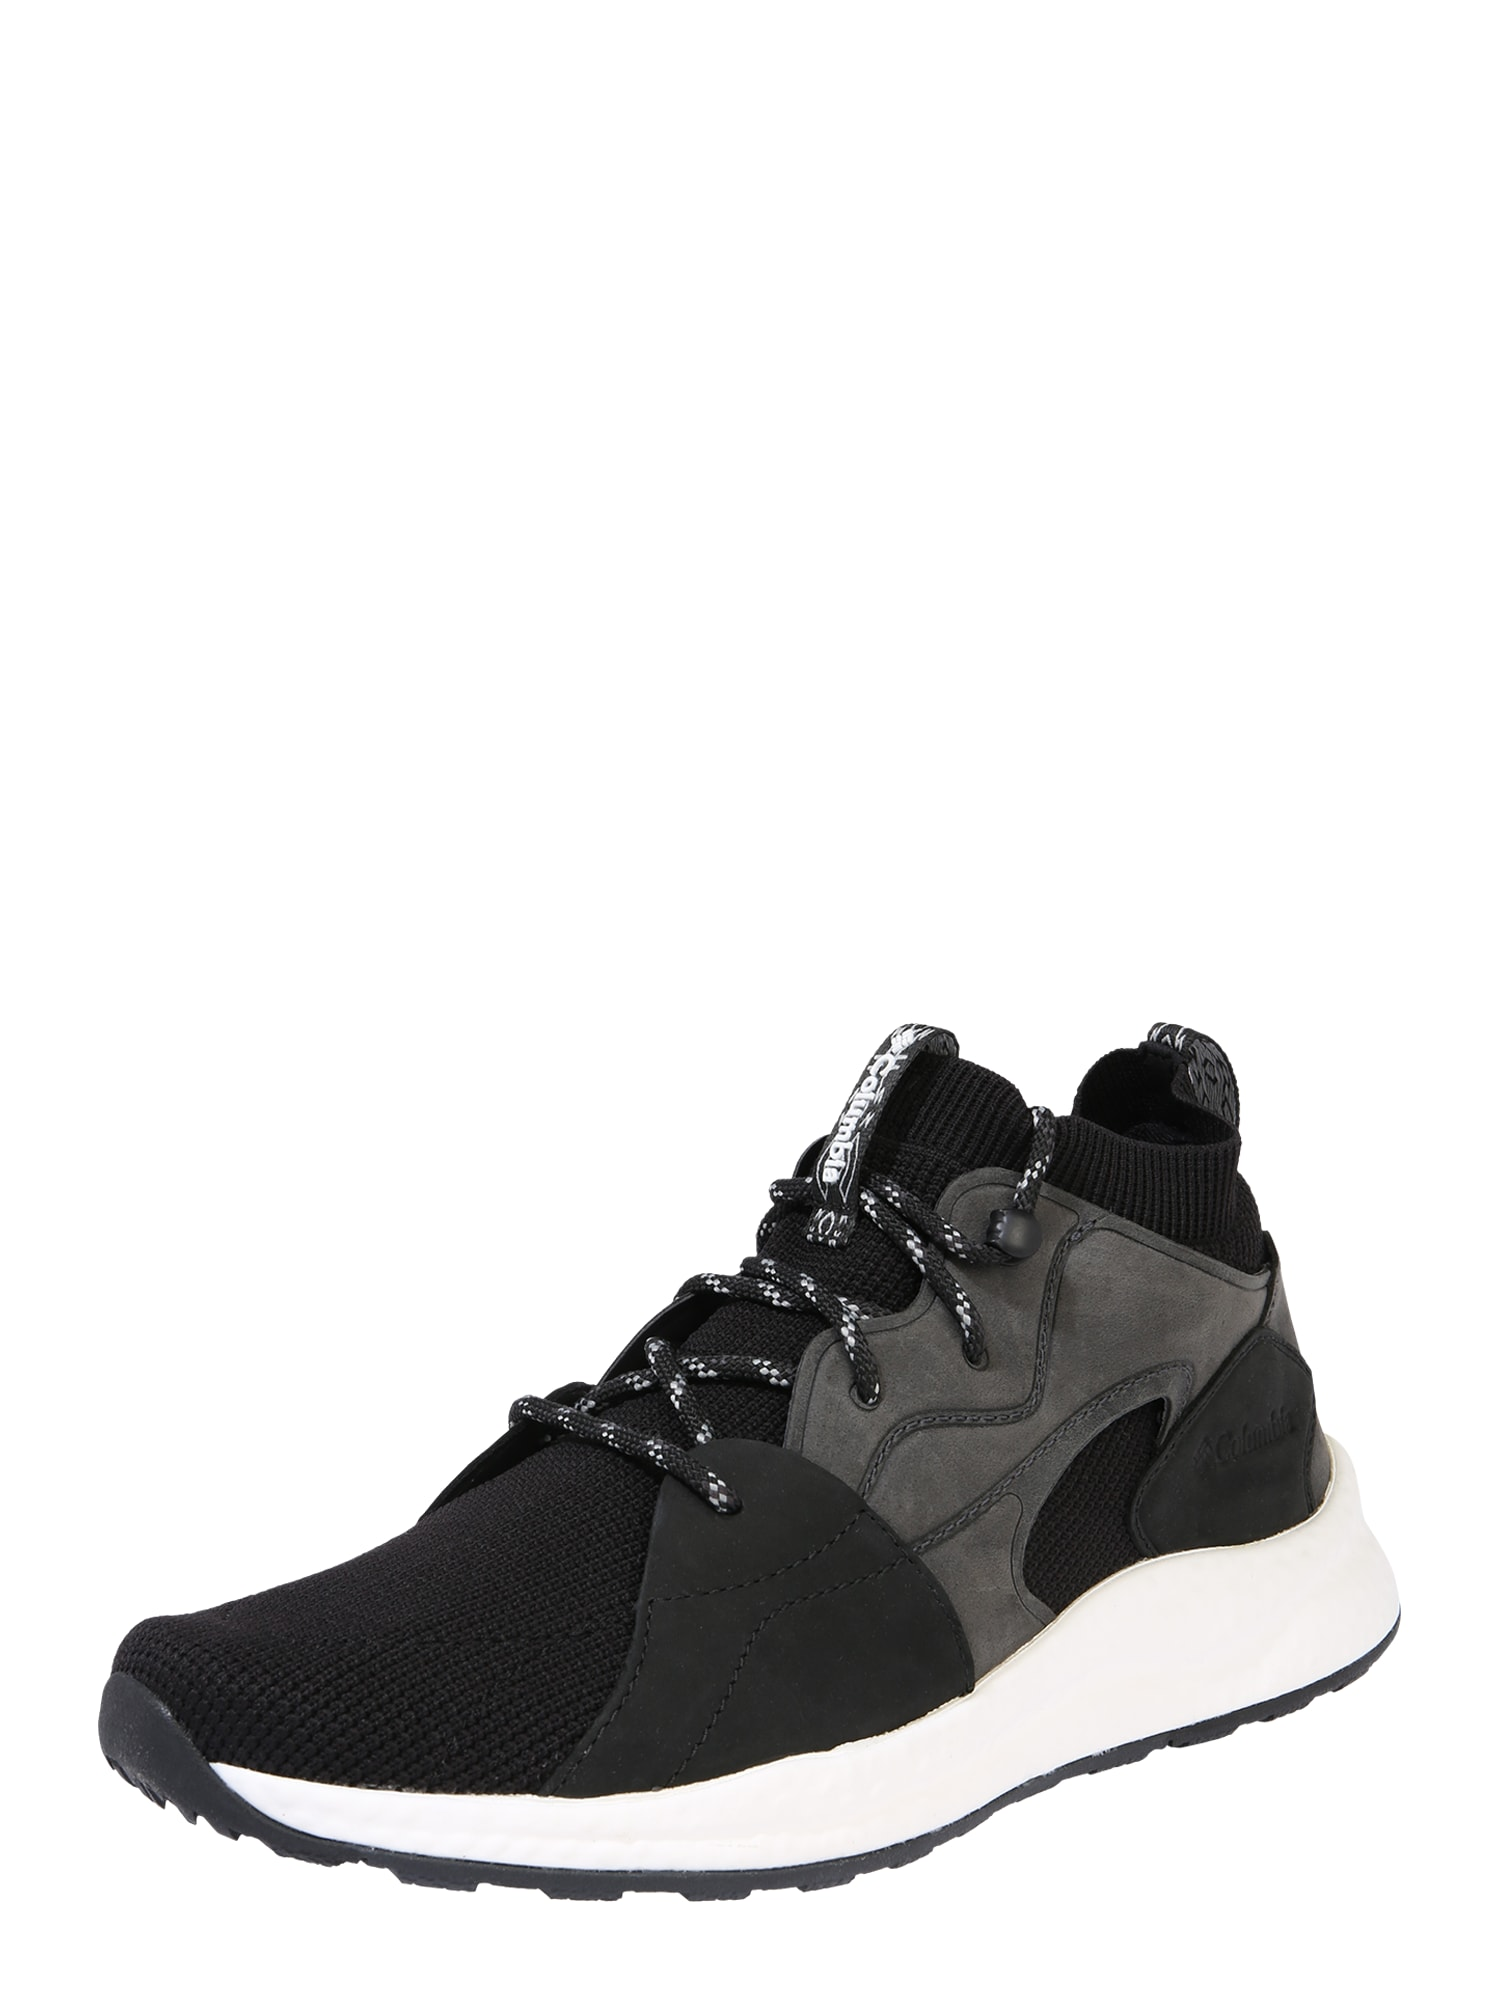 COLUMBIA Bėgimo batai 'SH/FT OD MID' juoda